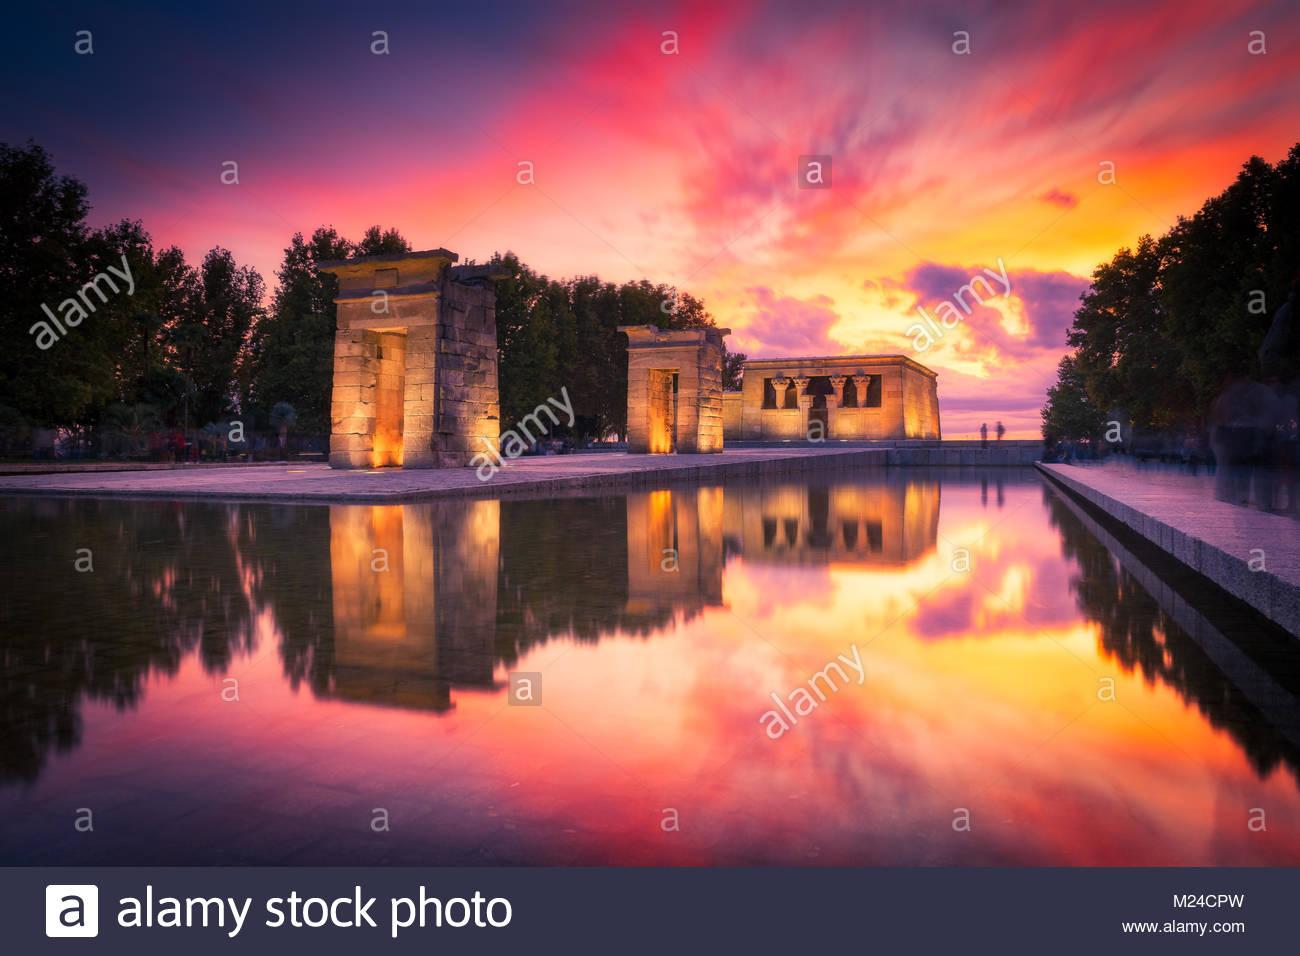 Templo de Debod at sunset. Madrid. - Stock Image